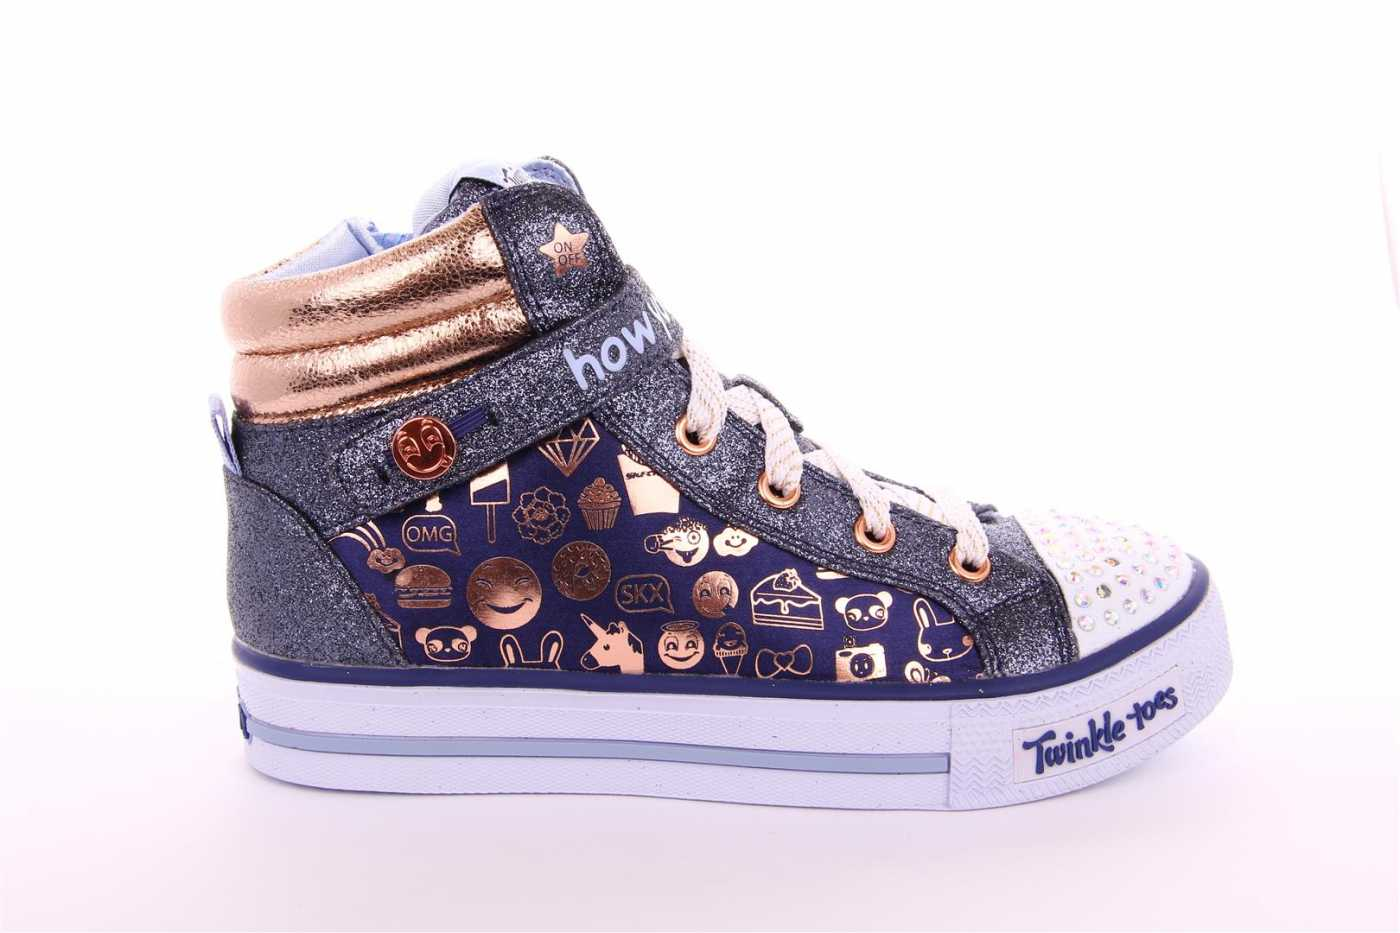 79f738d1251 Botas Tipo Joven Comprar Azul Color Zapato Estilo Lona Niña HBqBUR6 ...